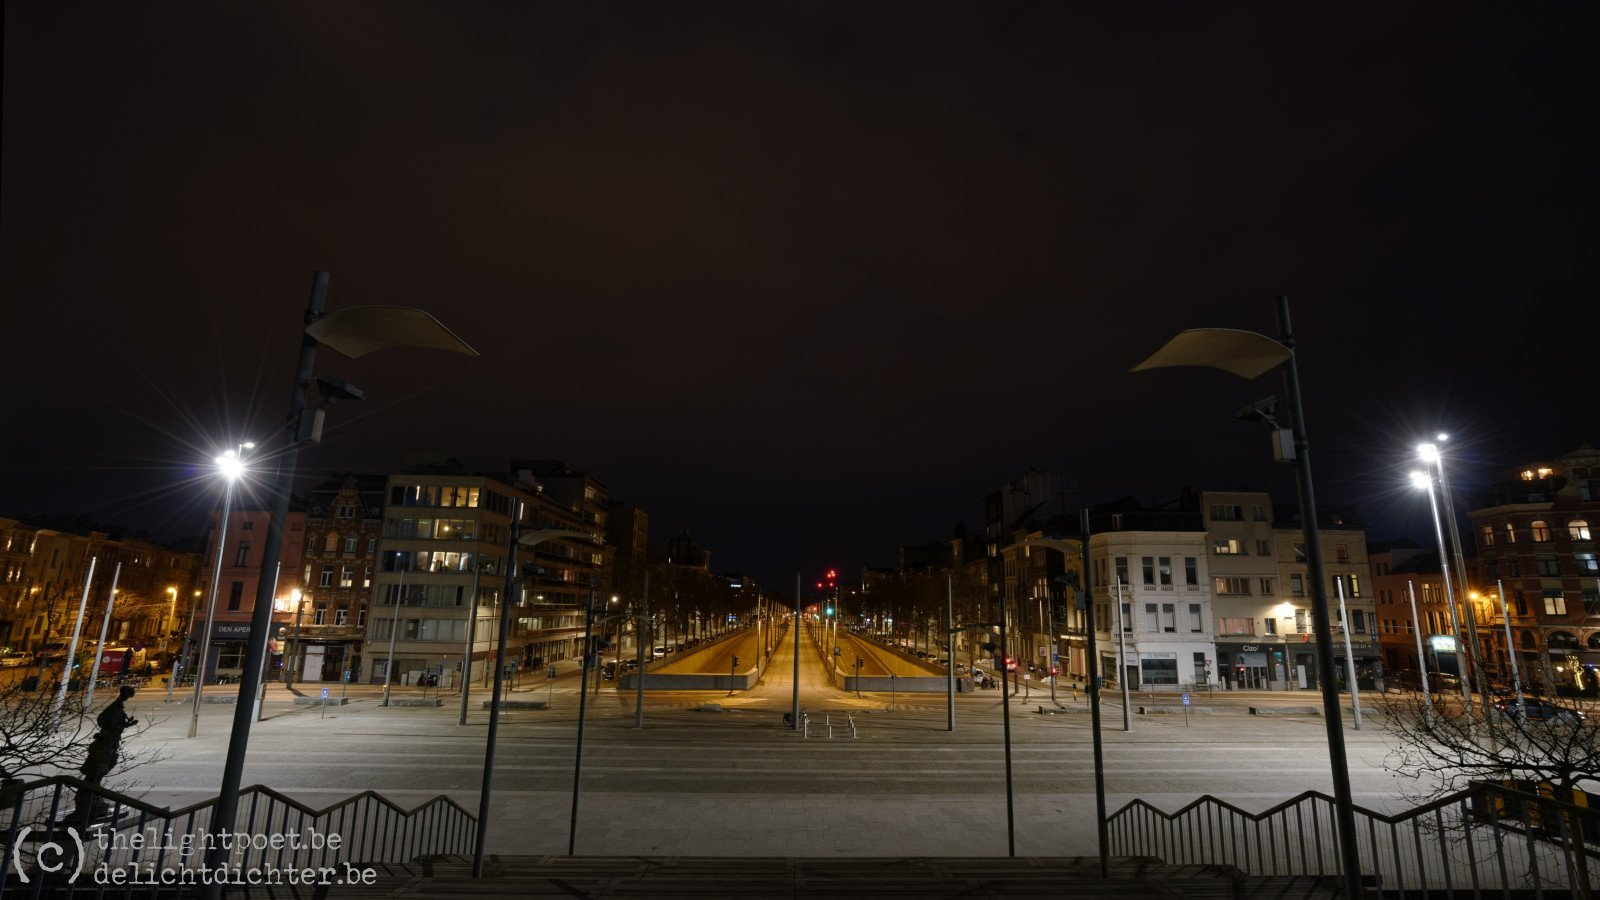 2020_03_Antwerpen_20200318_203914_DxO_PL3_1600px